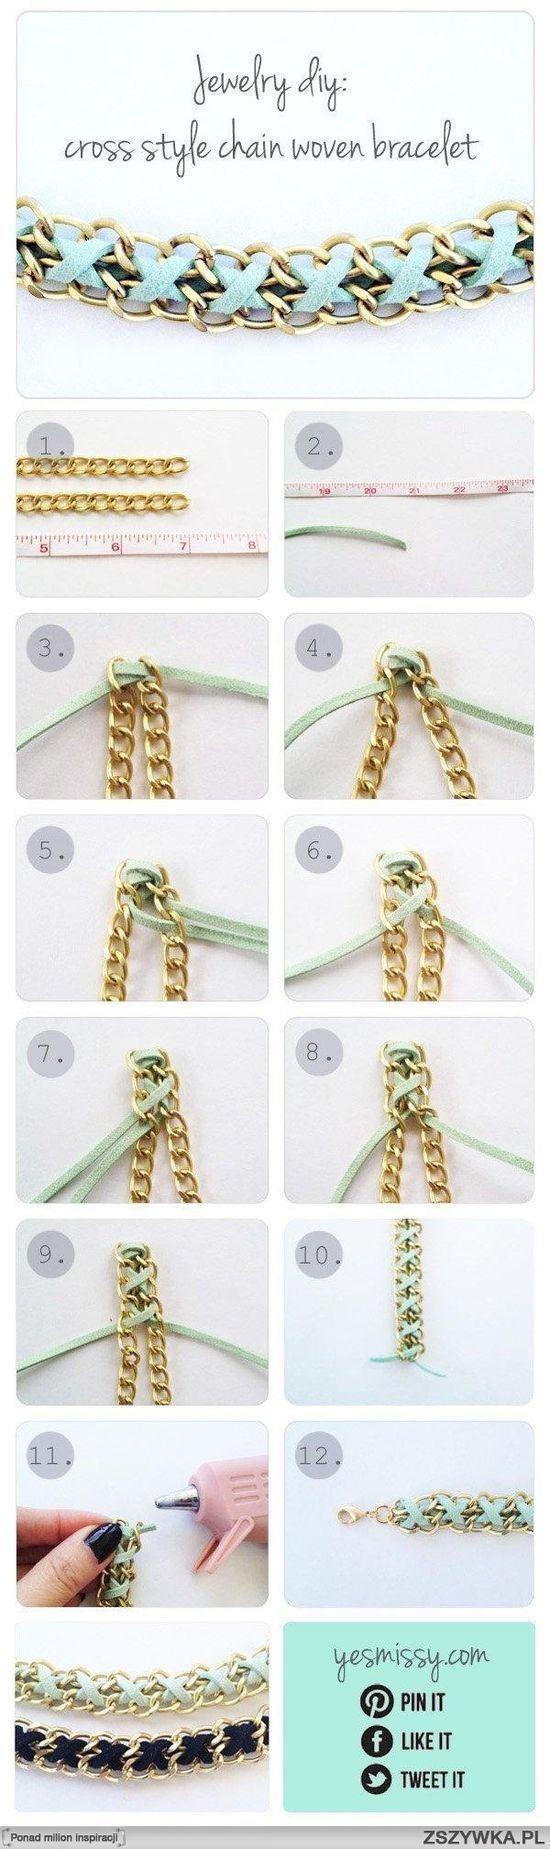 DIY | http://doityourselfcollections.blogspot.com.....      http://www.allaboutallaboutallabout.com/